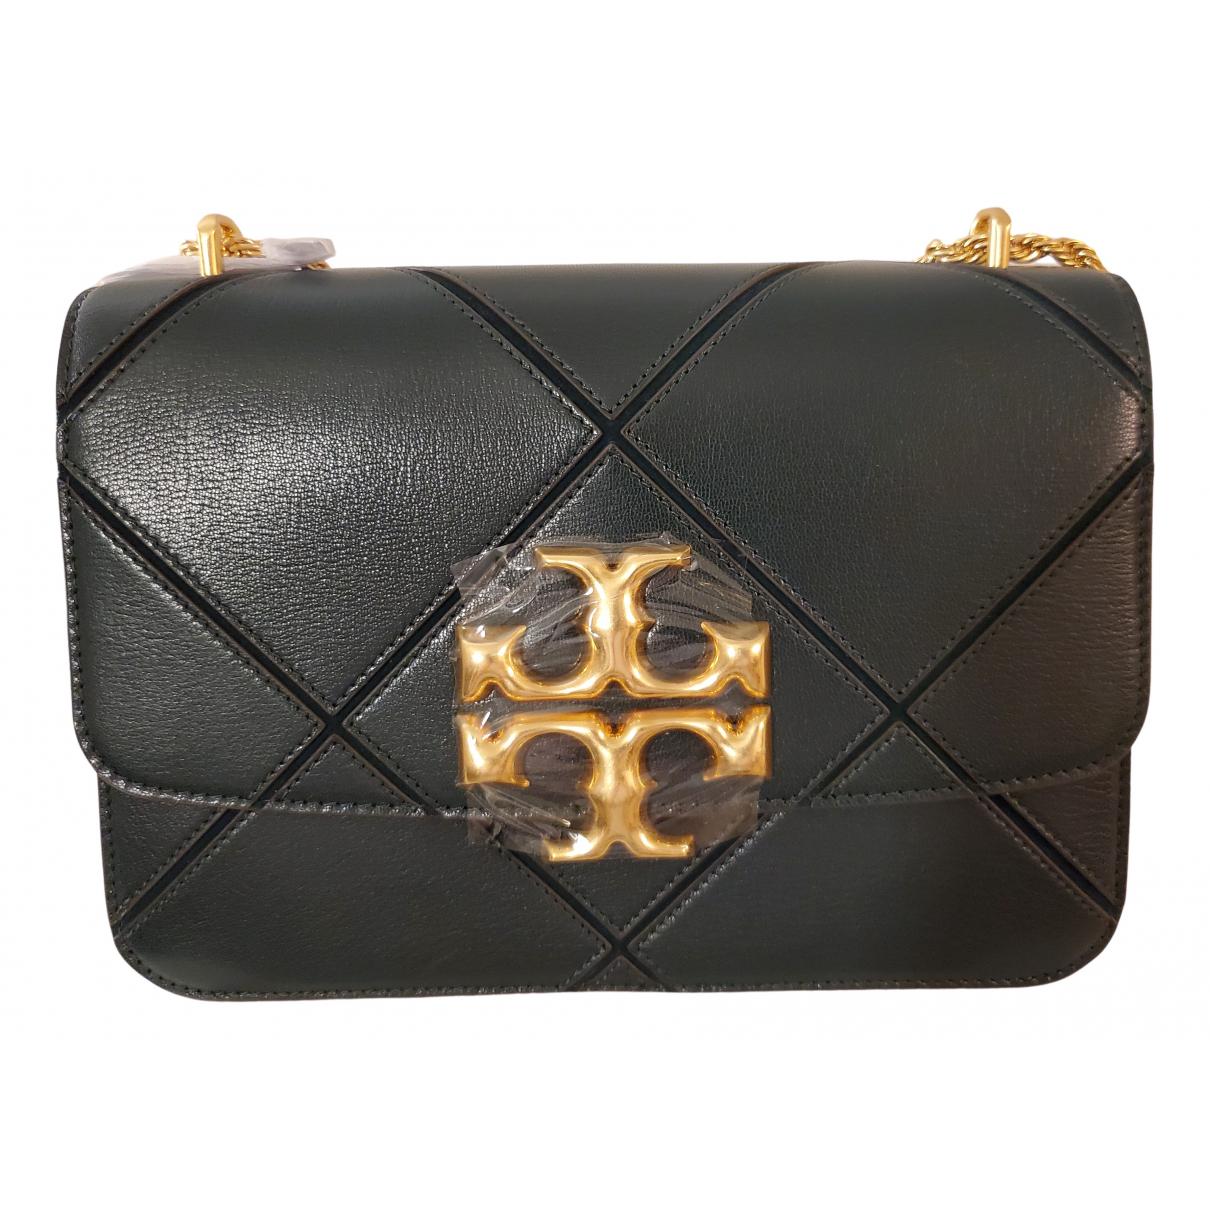 Tory Burch \N Handtasche in  Gruen Leder